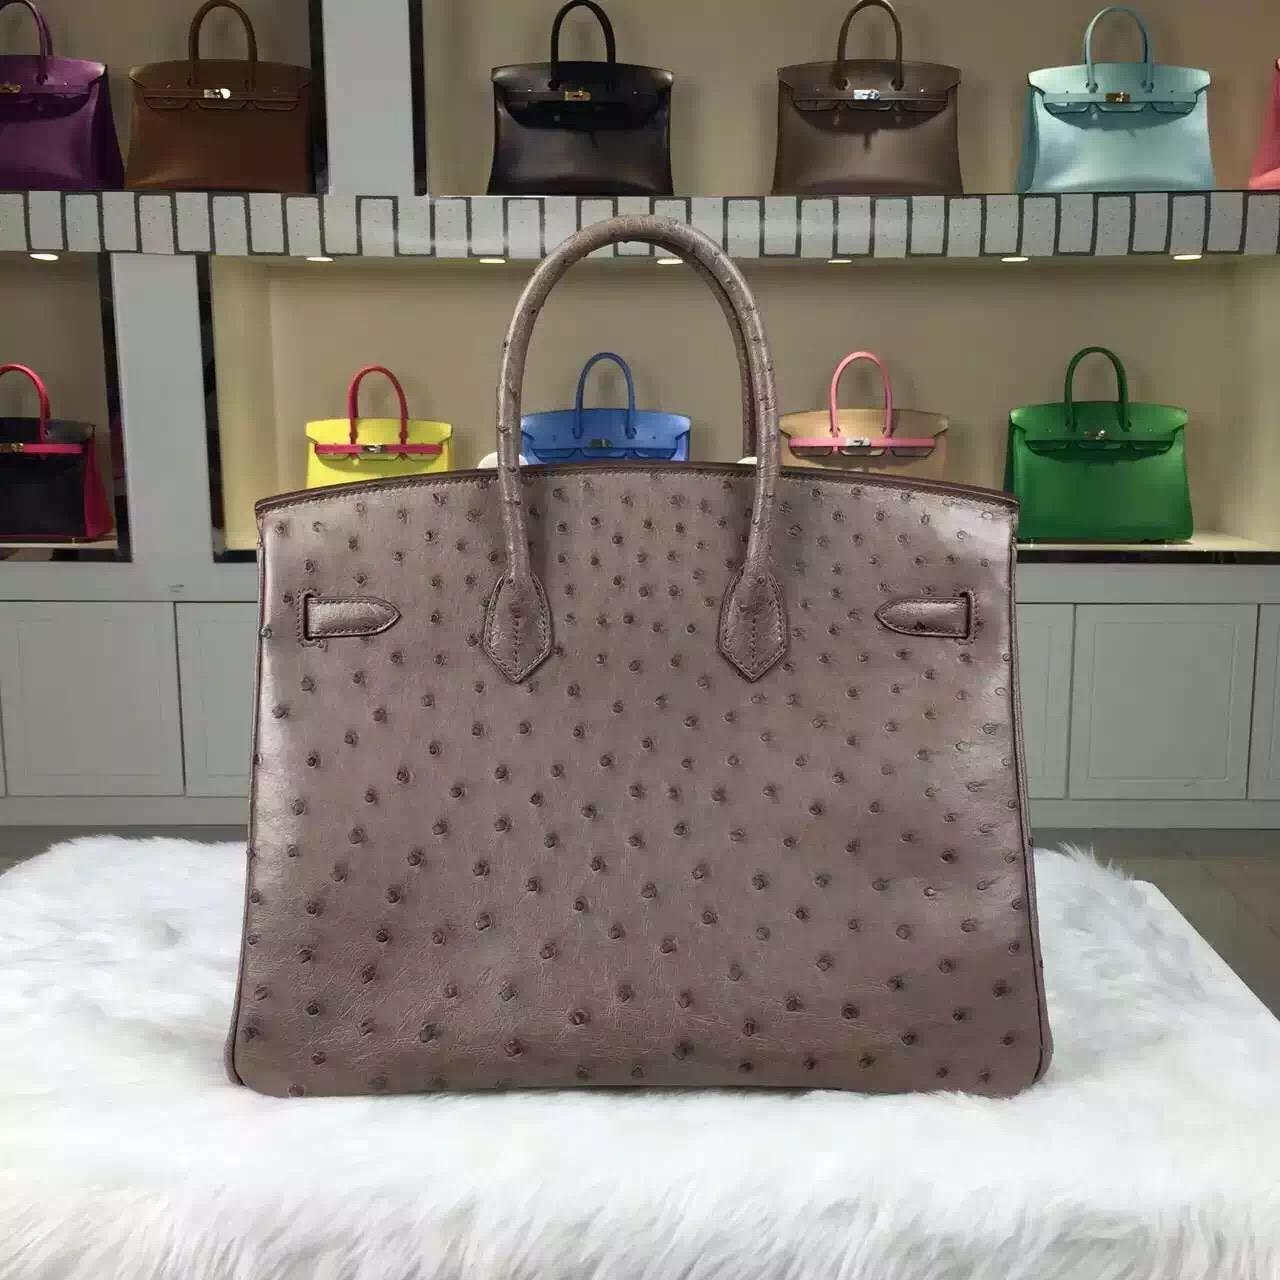 Luxury Women's Handbag Hermes Etoupe Grey Original Ostrich Leather Birkin Bag35cm